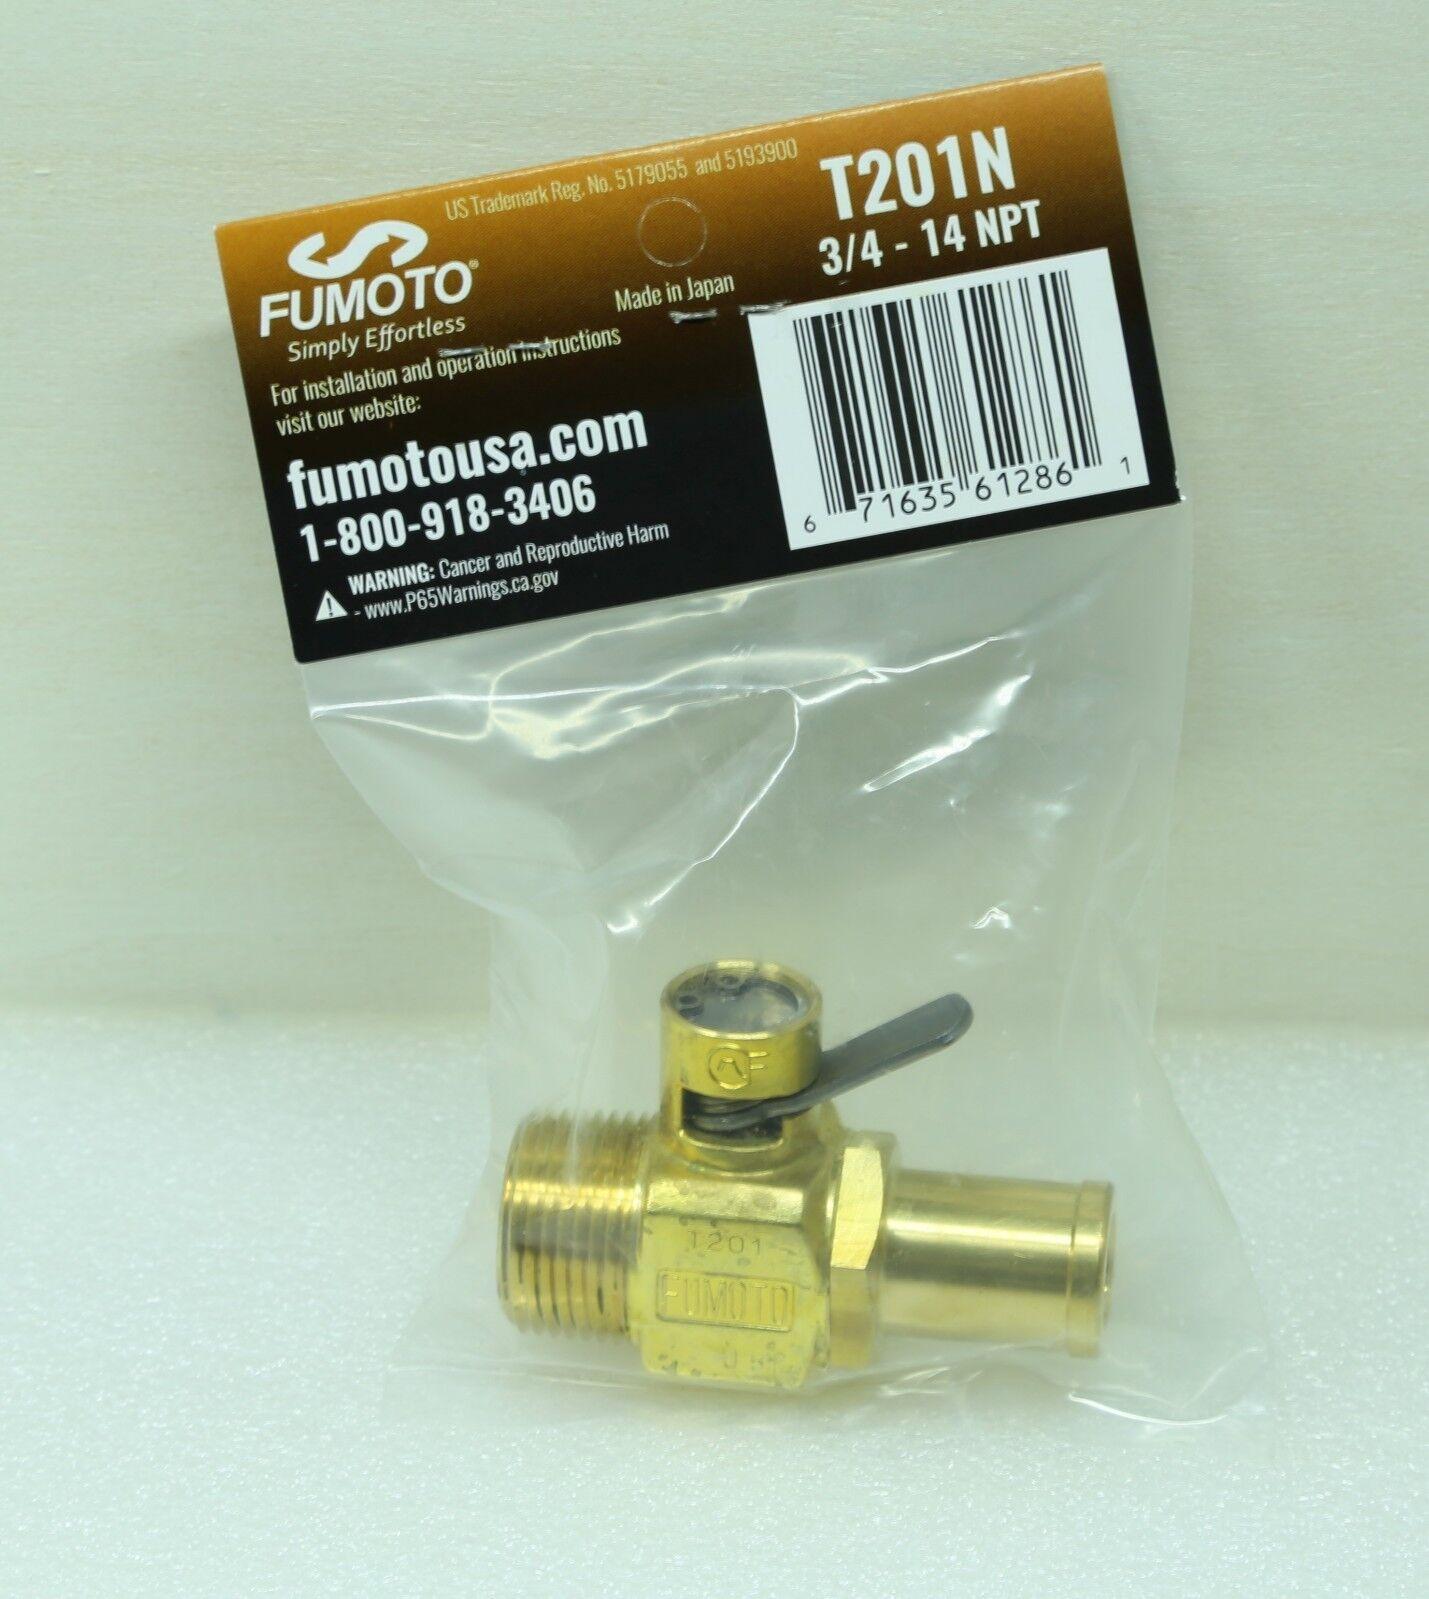 Fumoto ADP-201 Adapter for T201 Oil Drain Valve 3//4-14 NPT